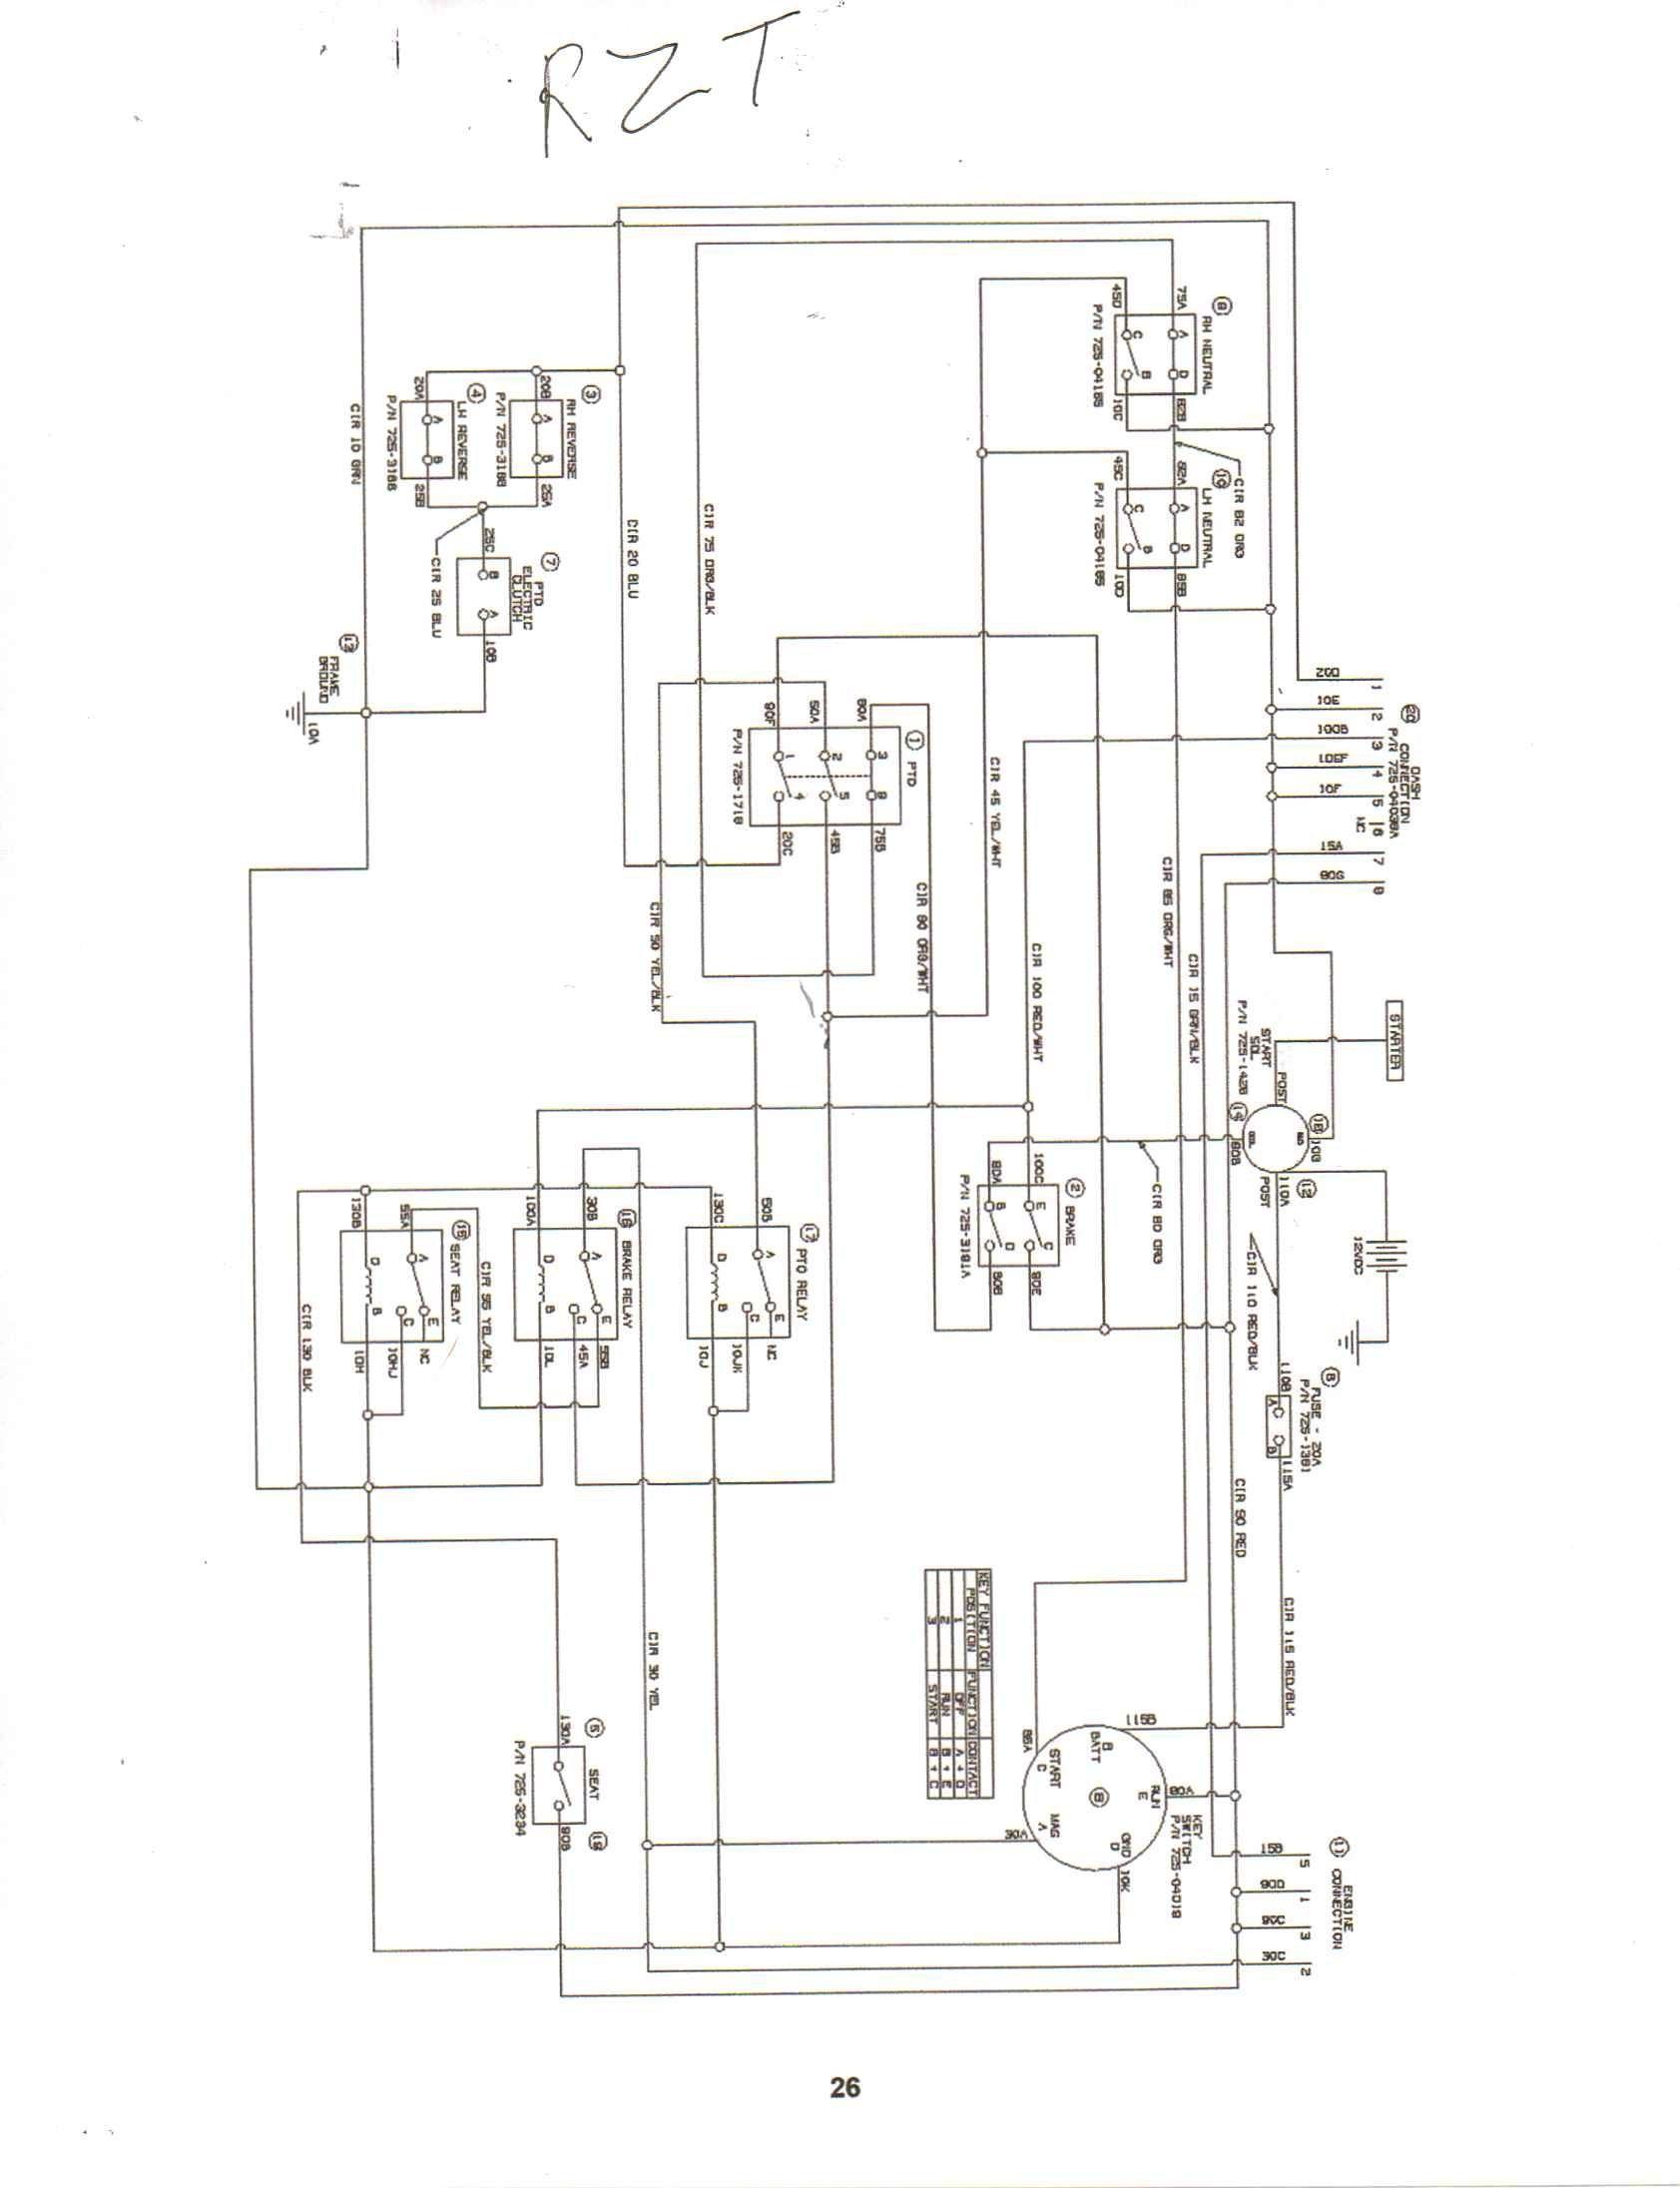 nissan truck wiring diagram u2013 dogboi info